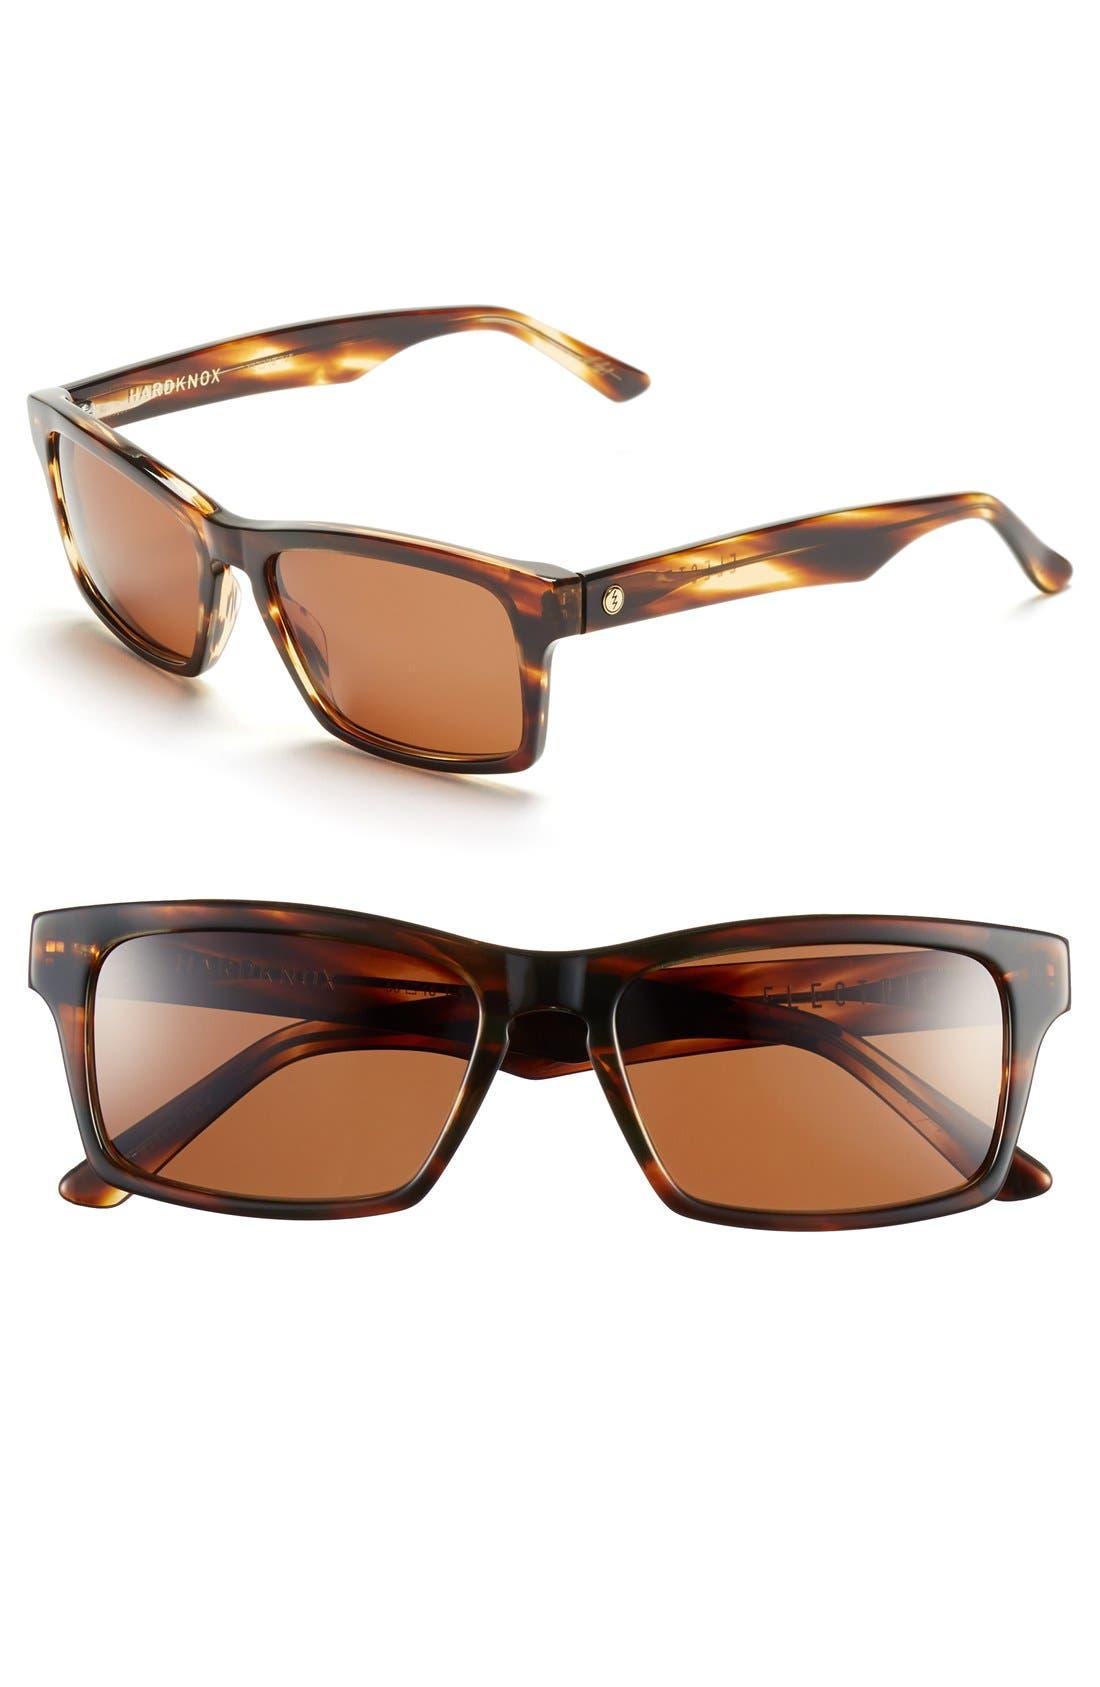 'Hardknox' 56mm Sunglasses,                         Main,                         color, Tortoise Shell/ Bronze